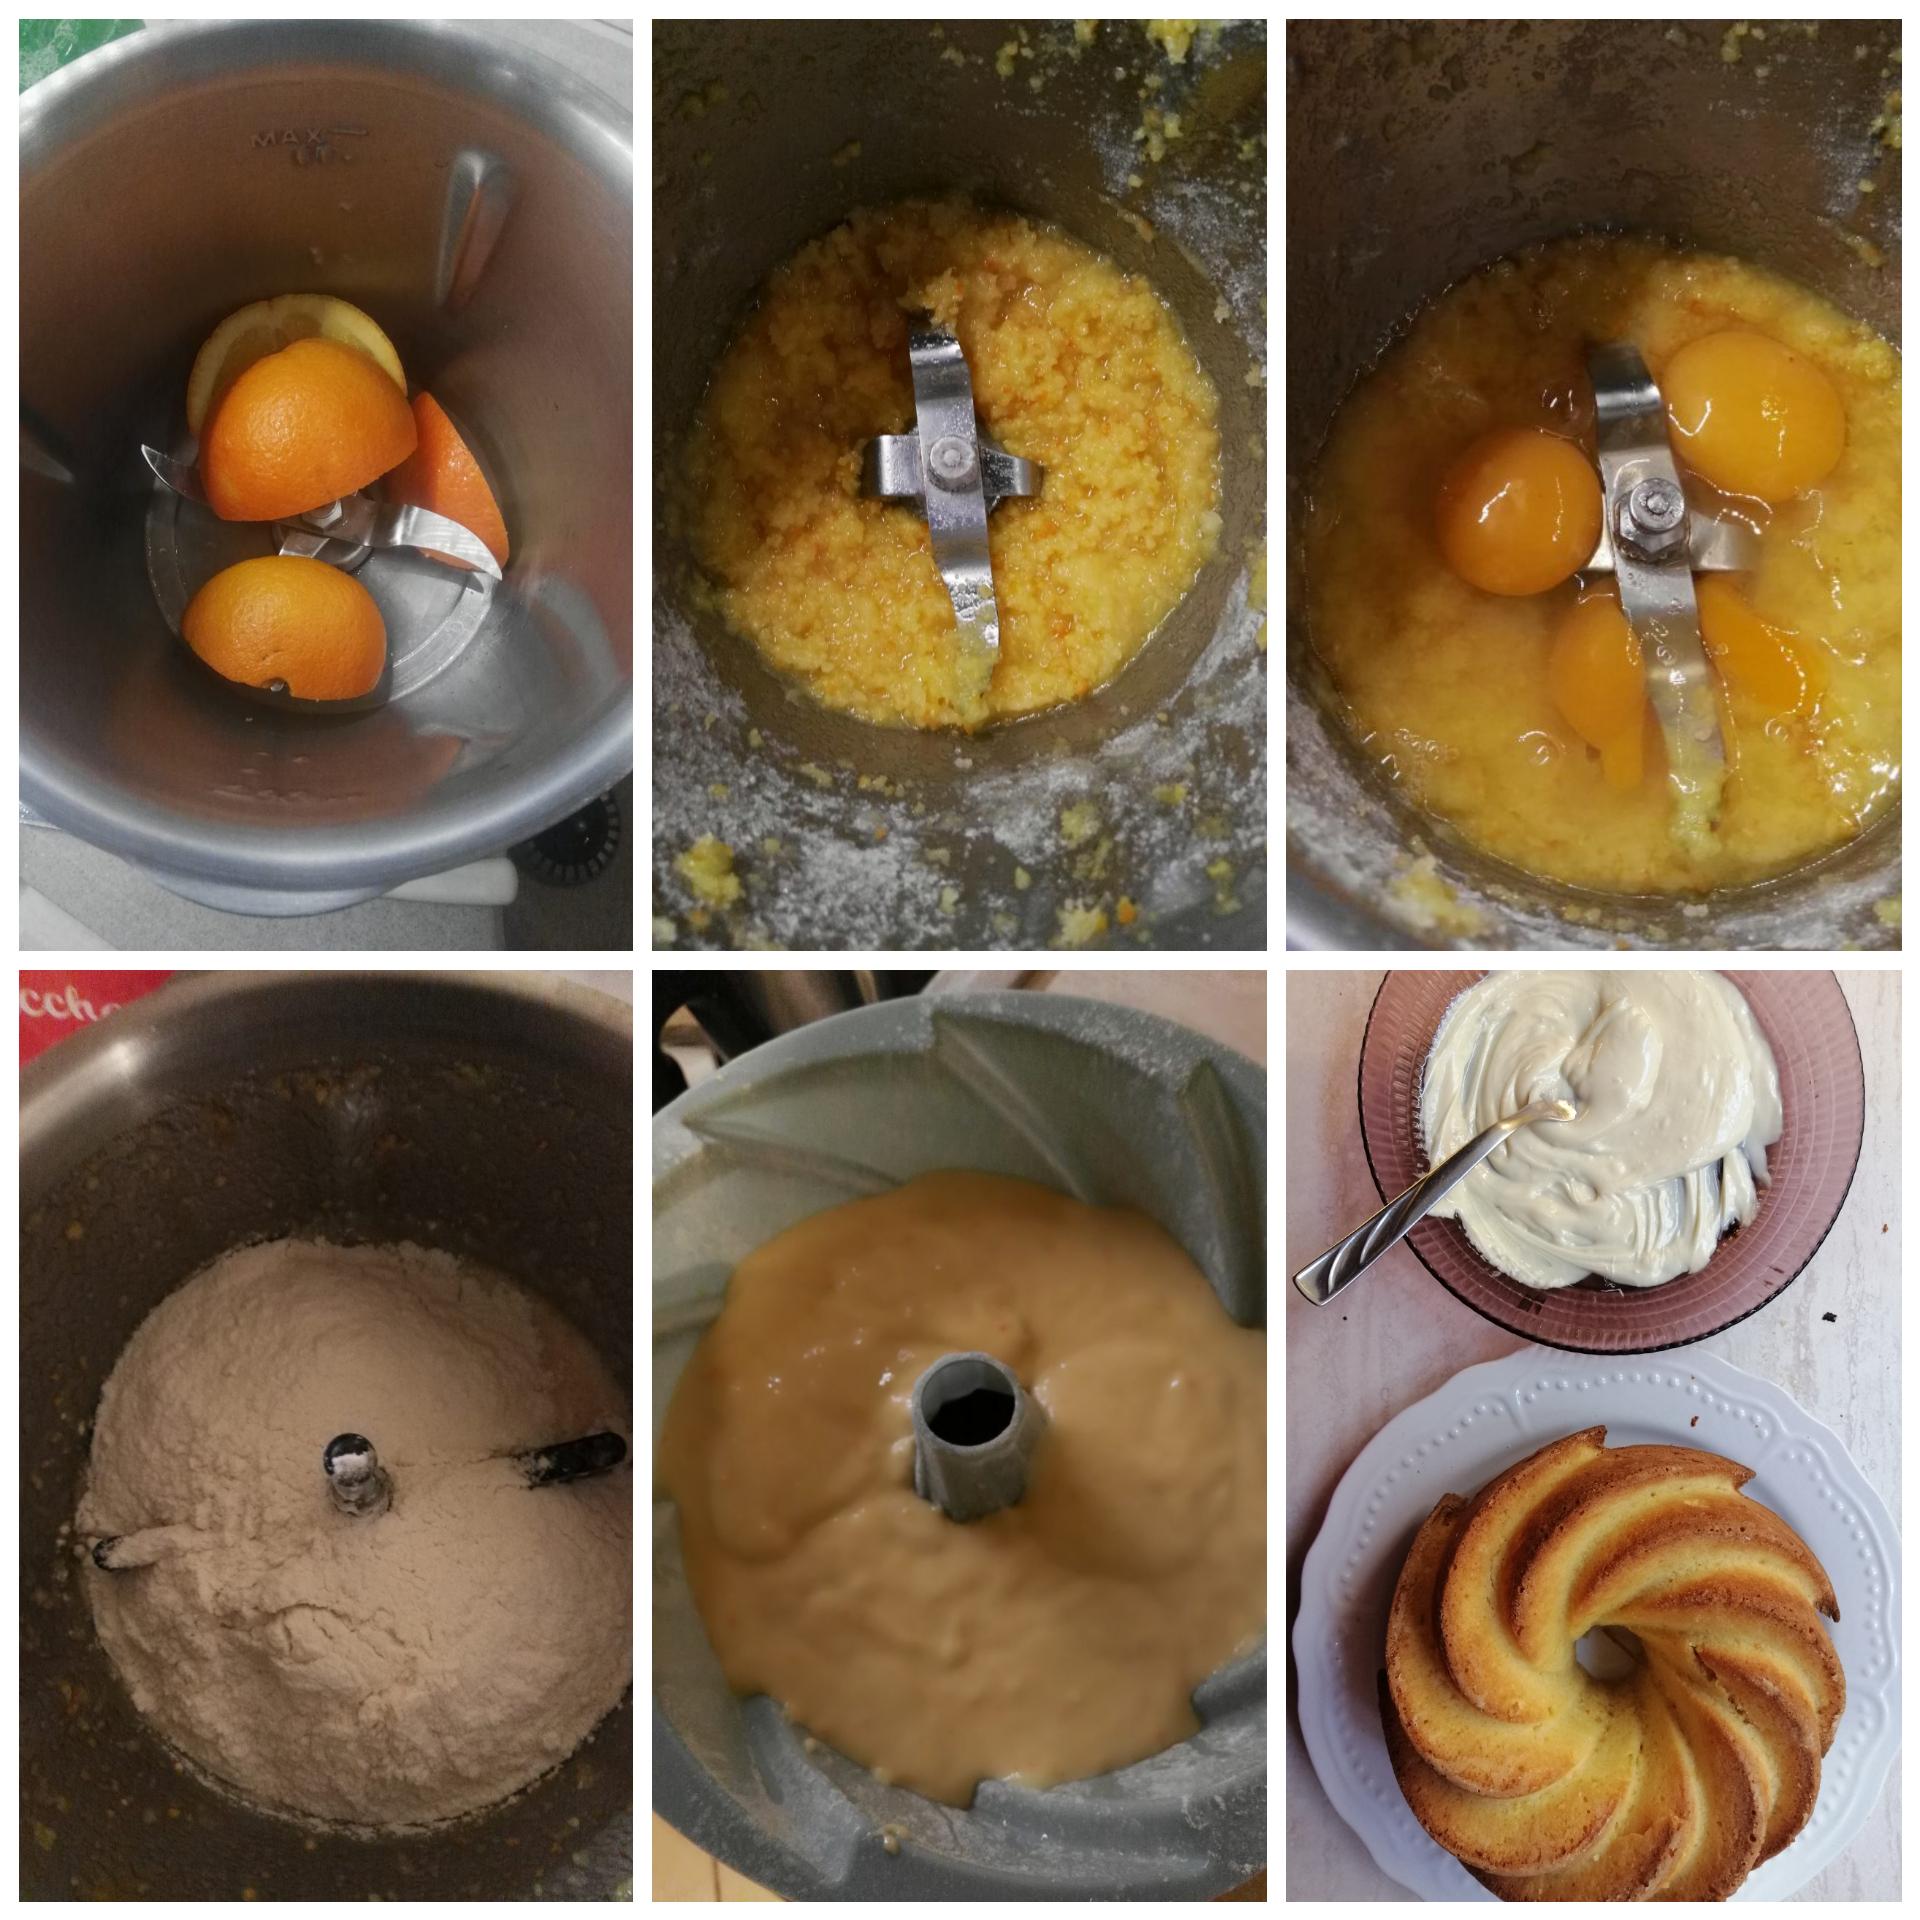 Pan d'arancio al cioccolato bianco